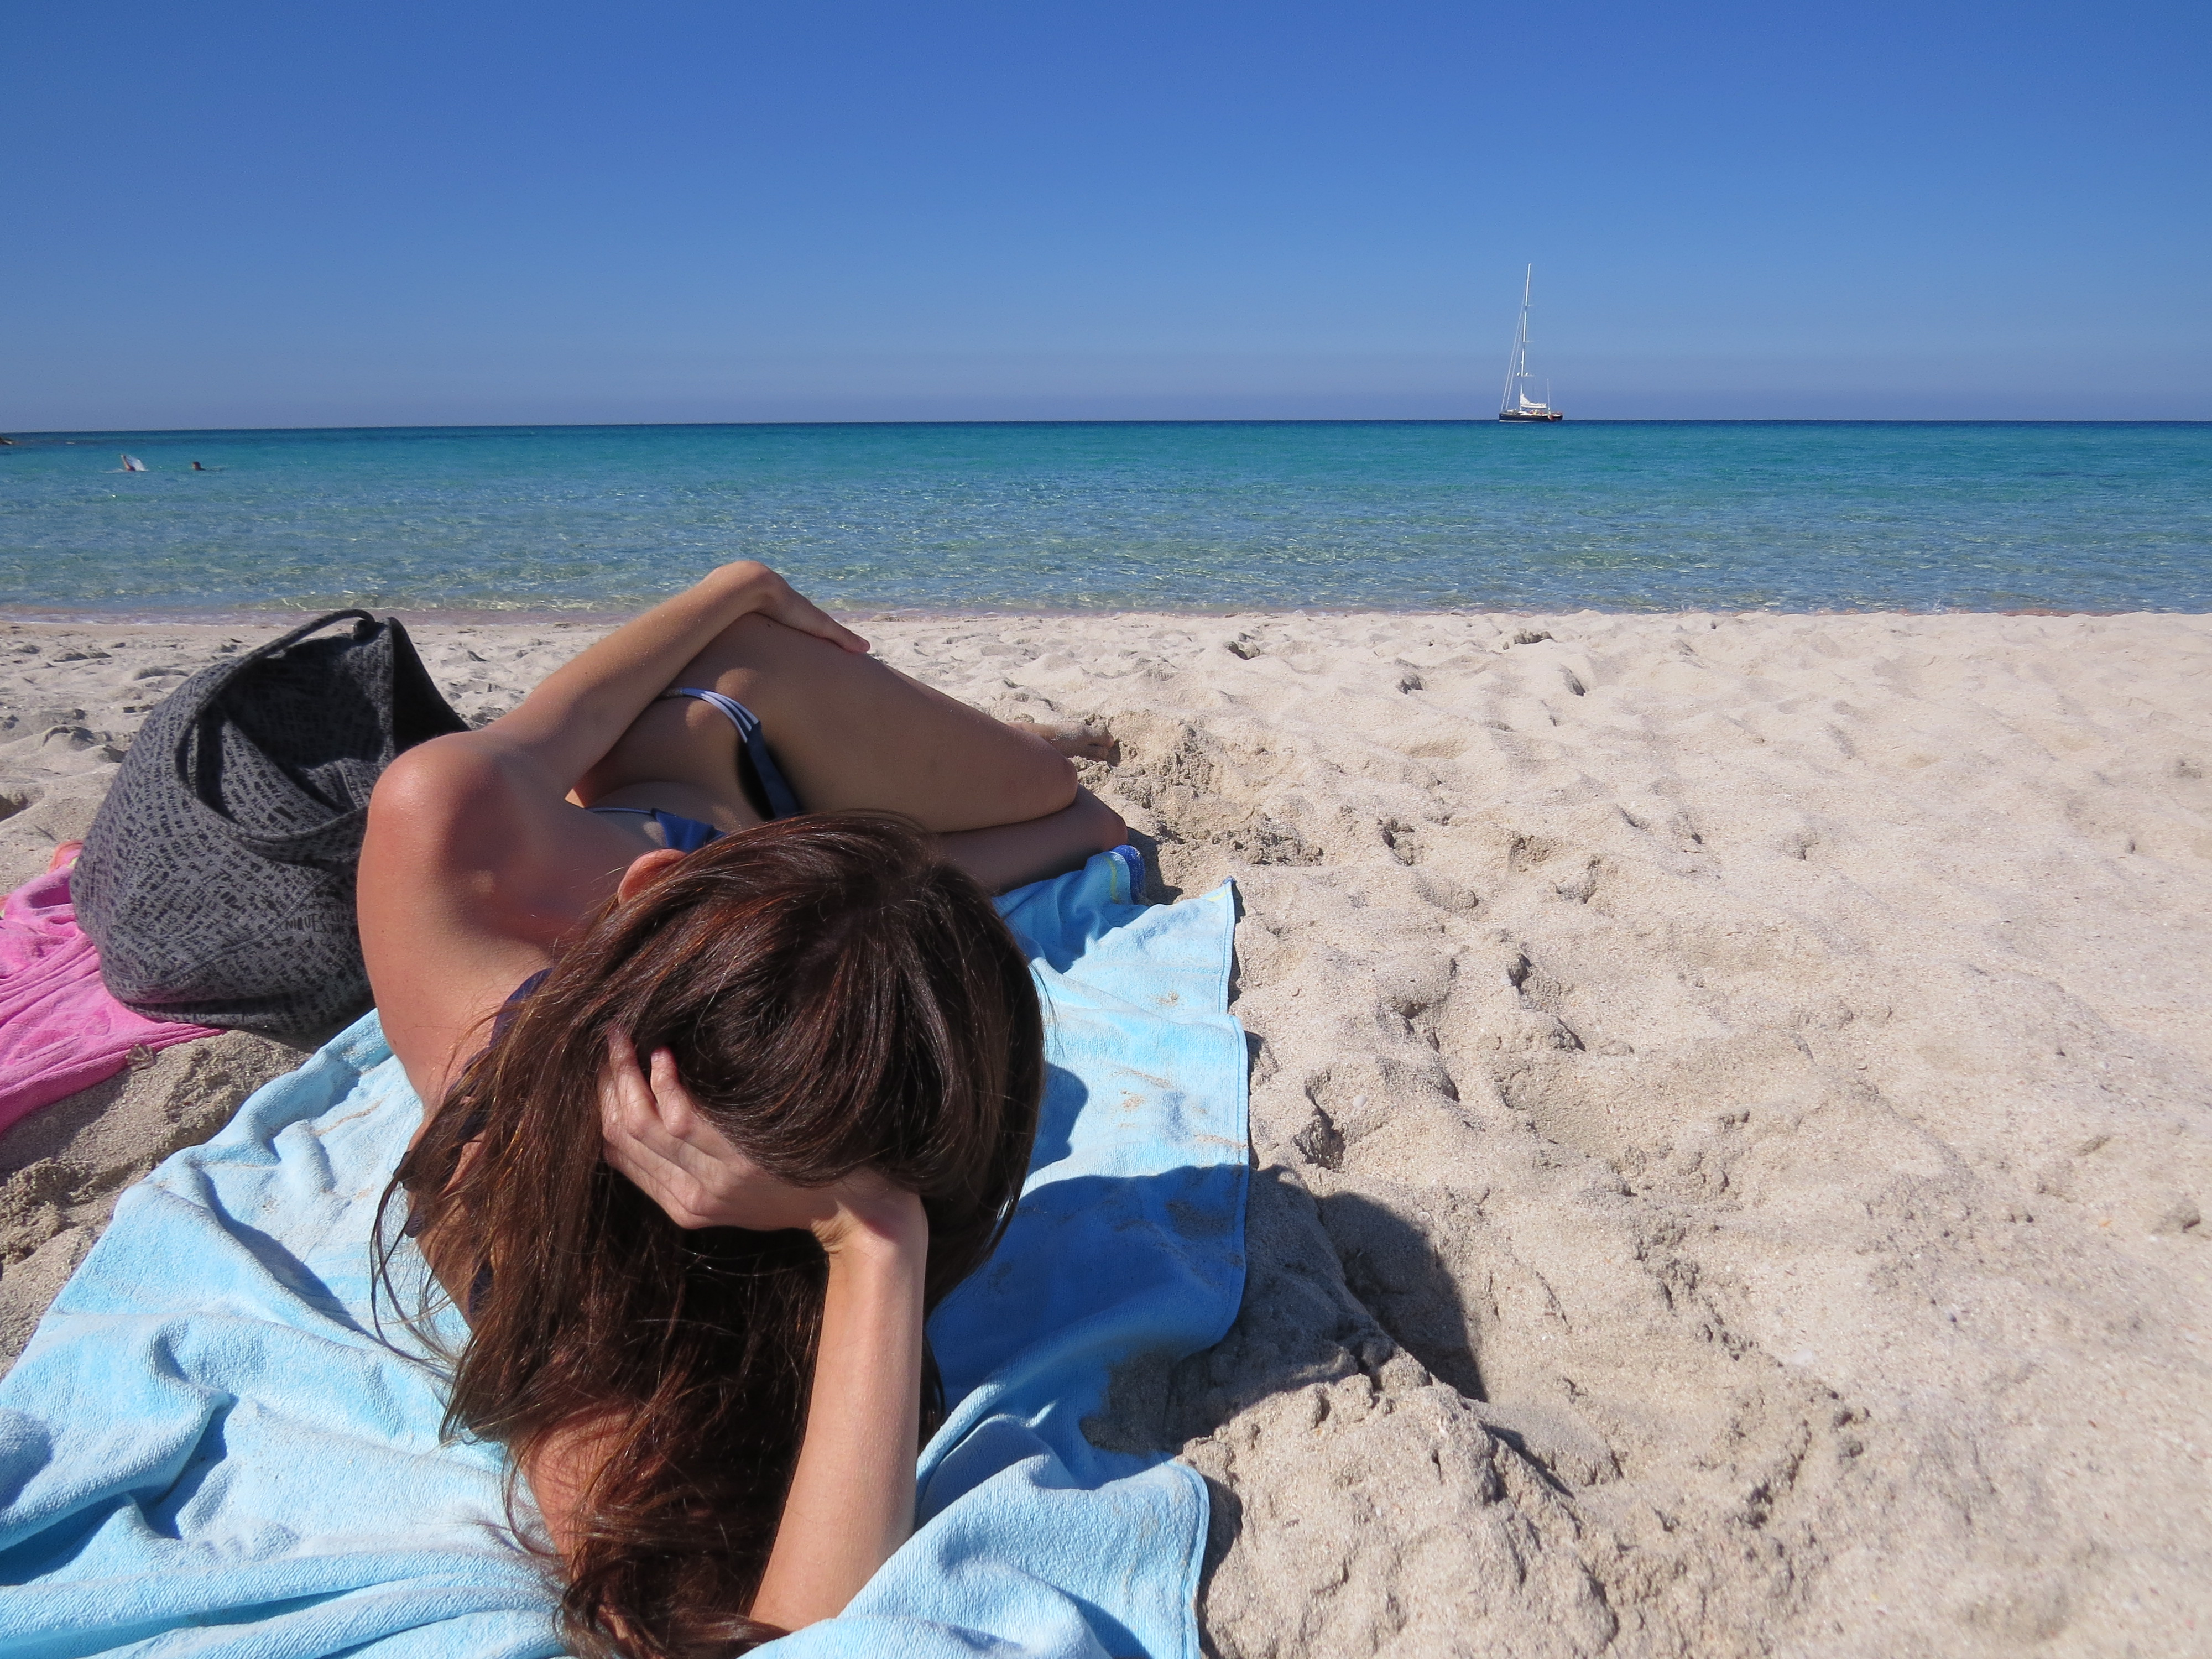 Corsica, titolare stabilimento spara a nudista